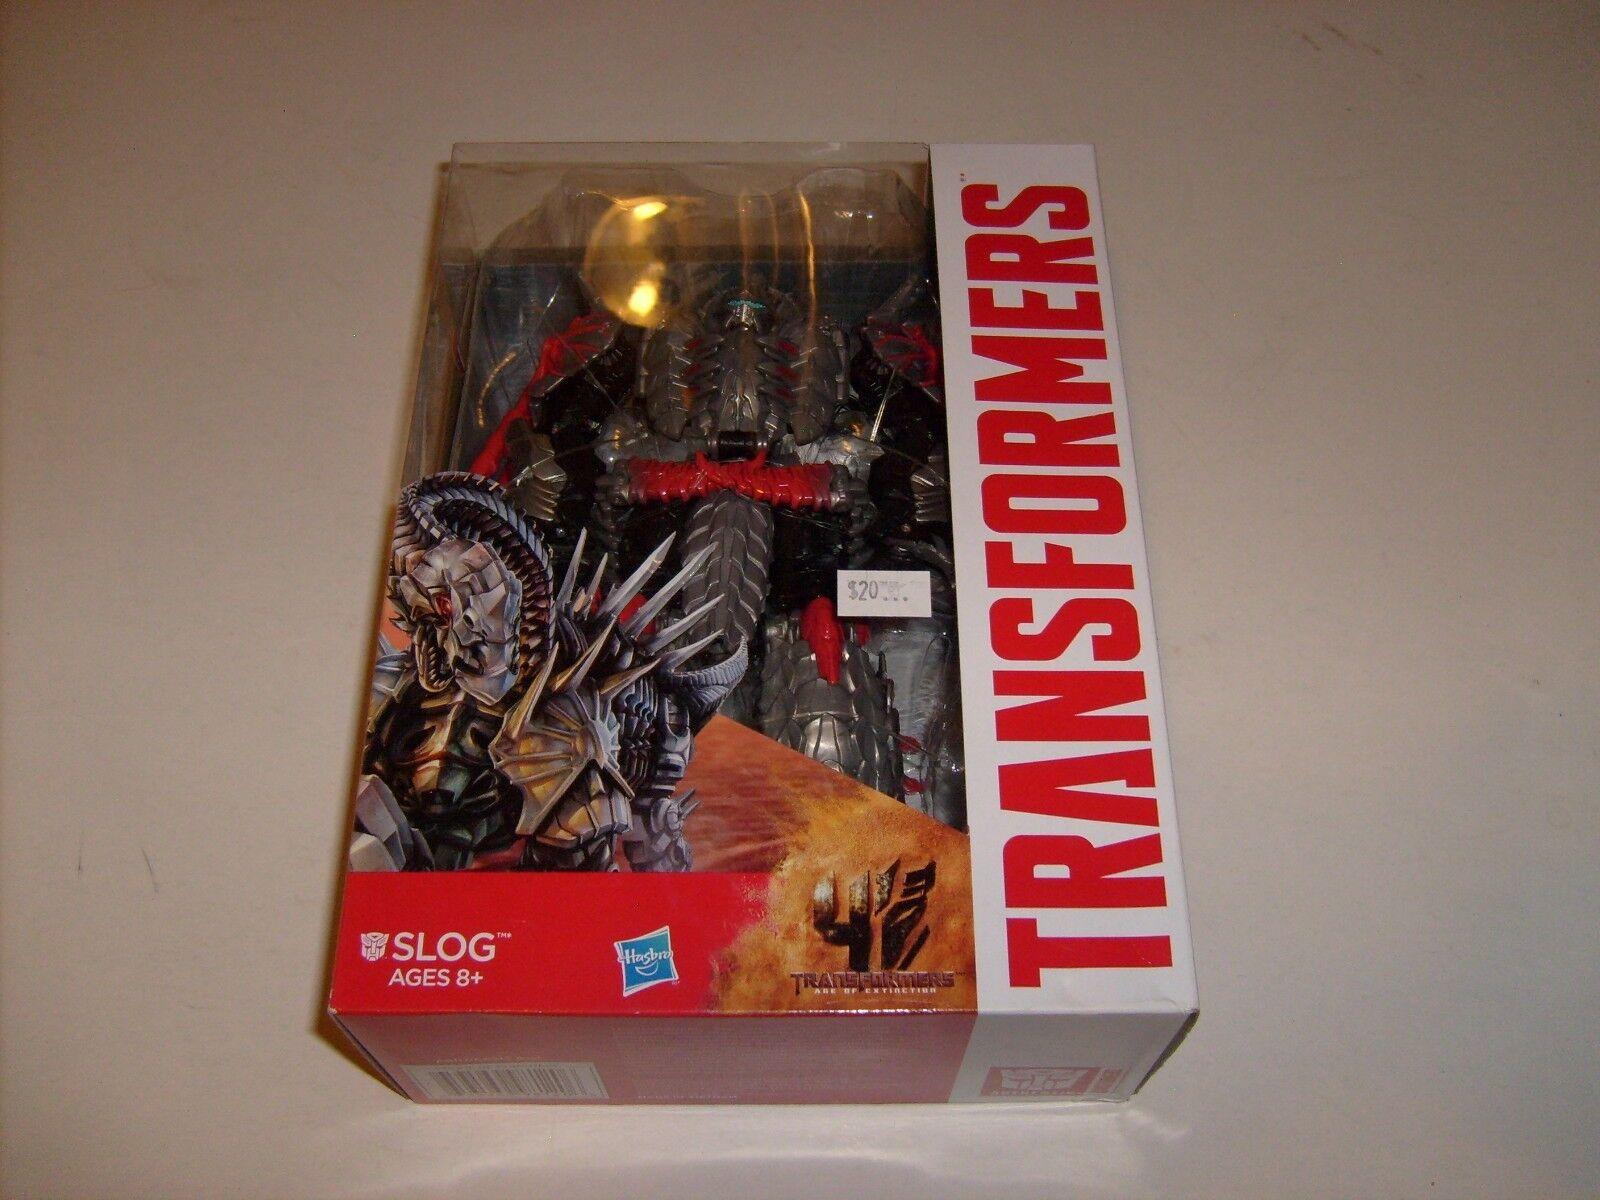 Hasbro Transformers Age of Extinction Generations Voyager SLOG NEW MIB HASBRO